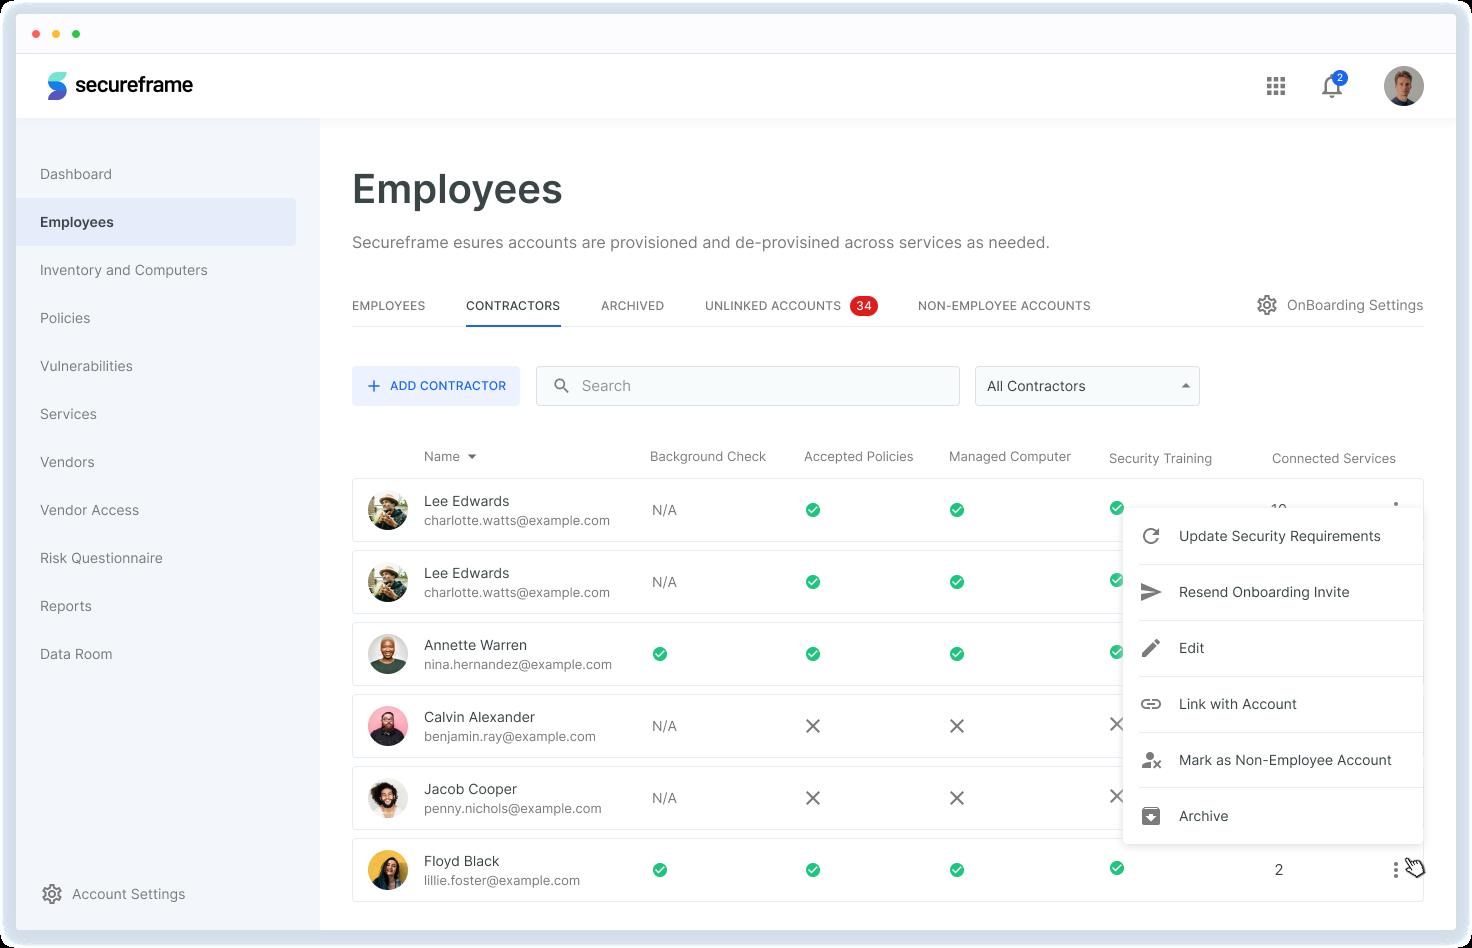 Secureframe employees